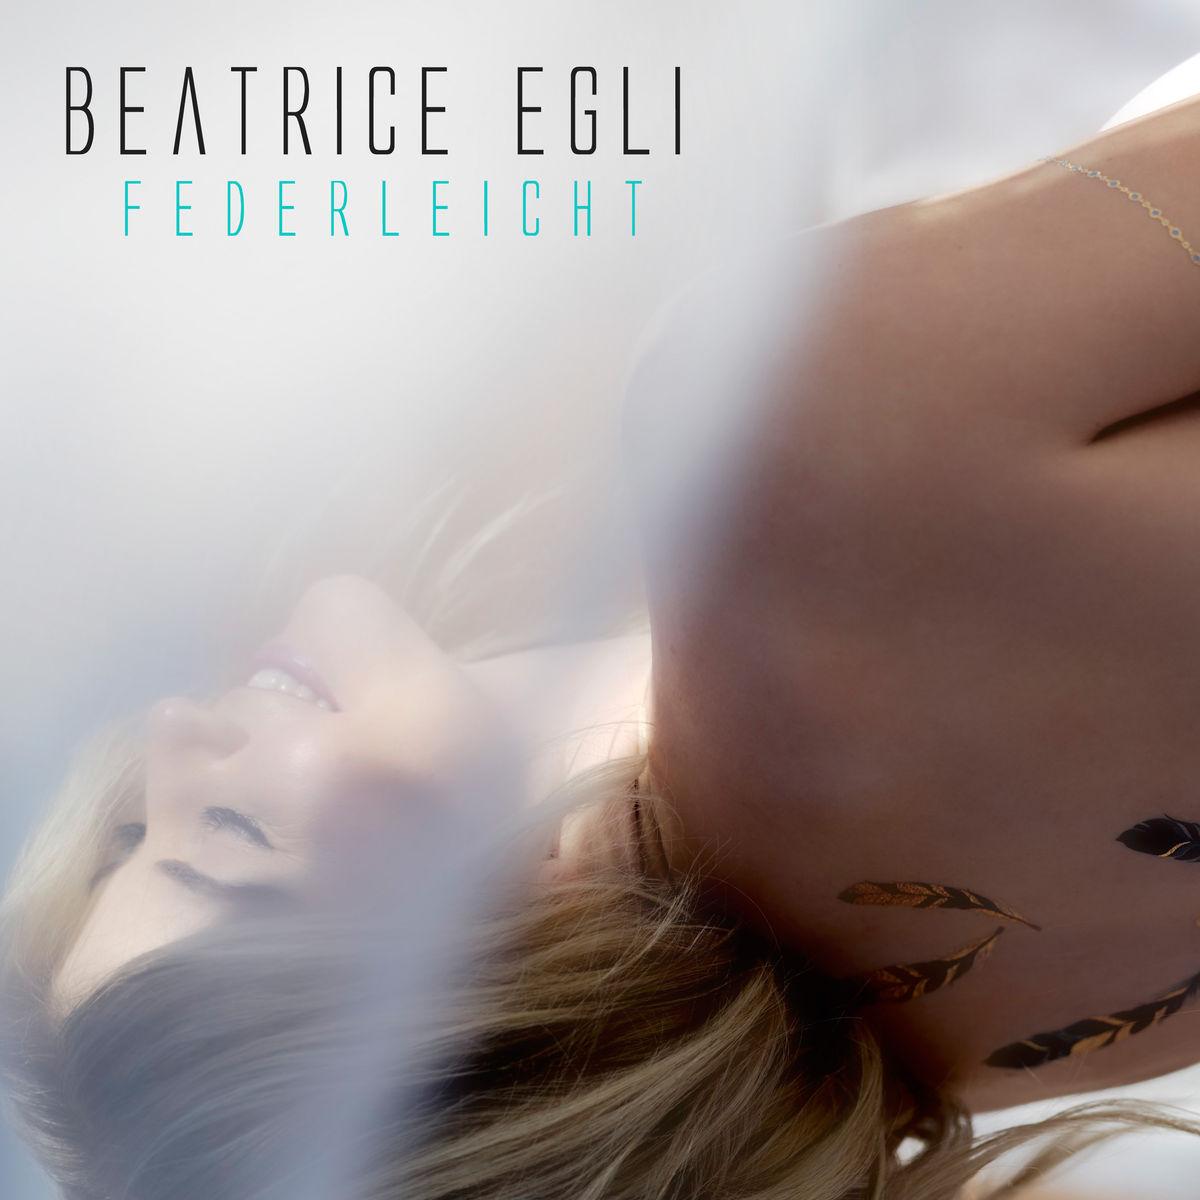 Beatrice Egli_Federleicht (Silverjam Remix)_Produced by Silverjam